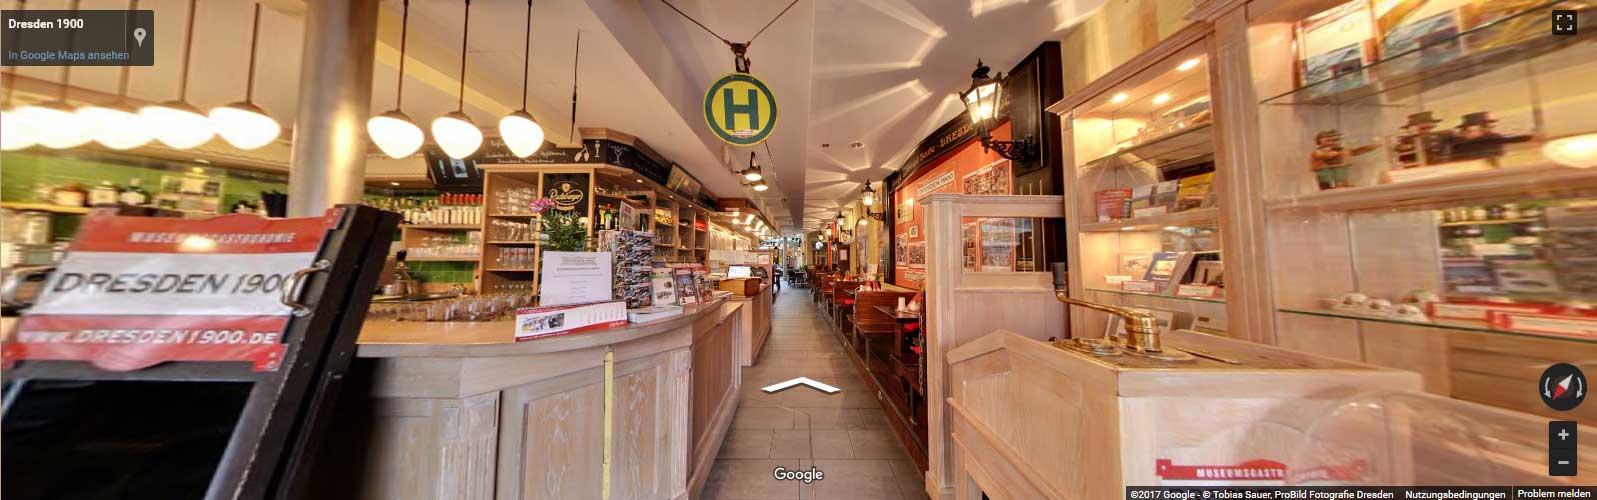 360° Rundgang durch unser Restaurant an der Frauenkirche